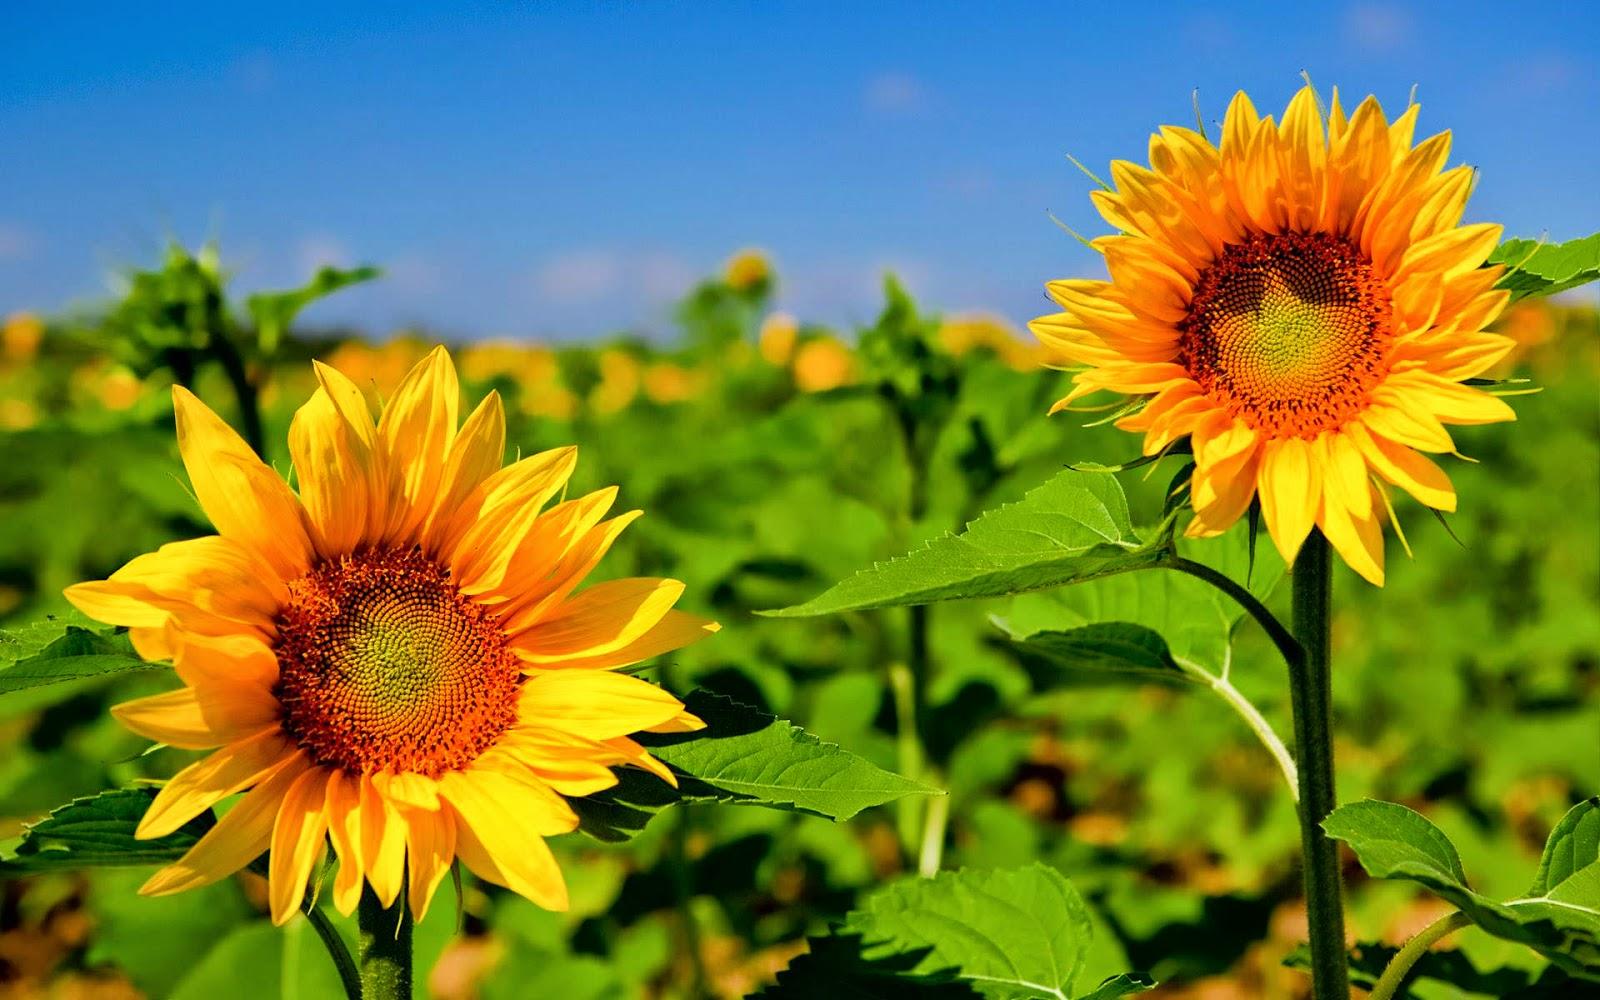 wallpaper bunga matahari,flower,sunflower,flowering plant,plant ...